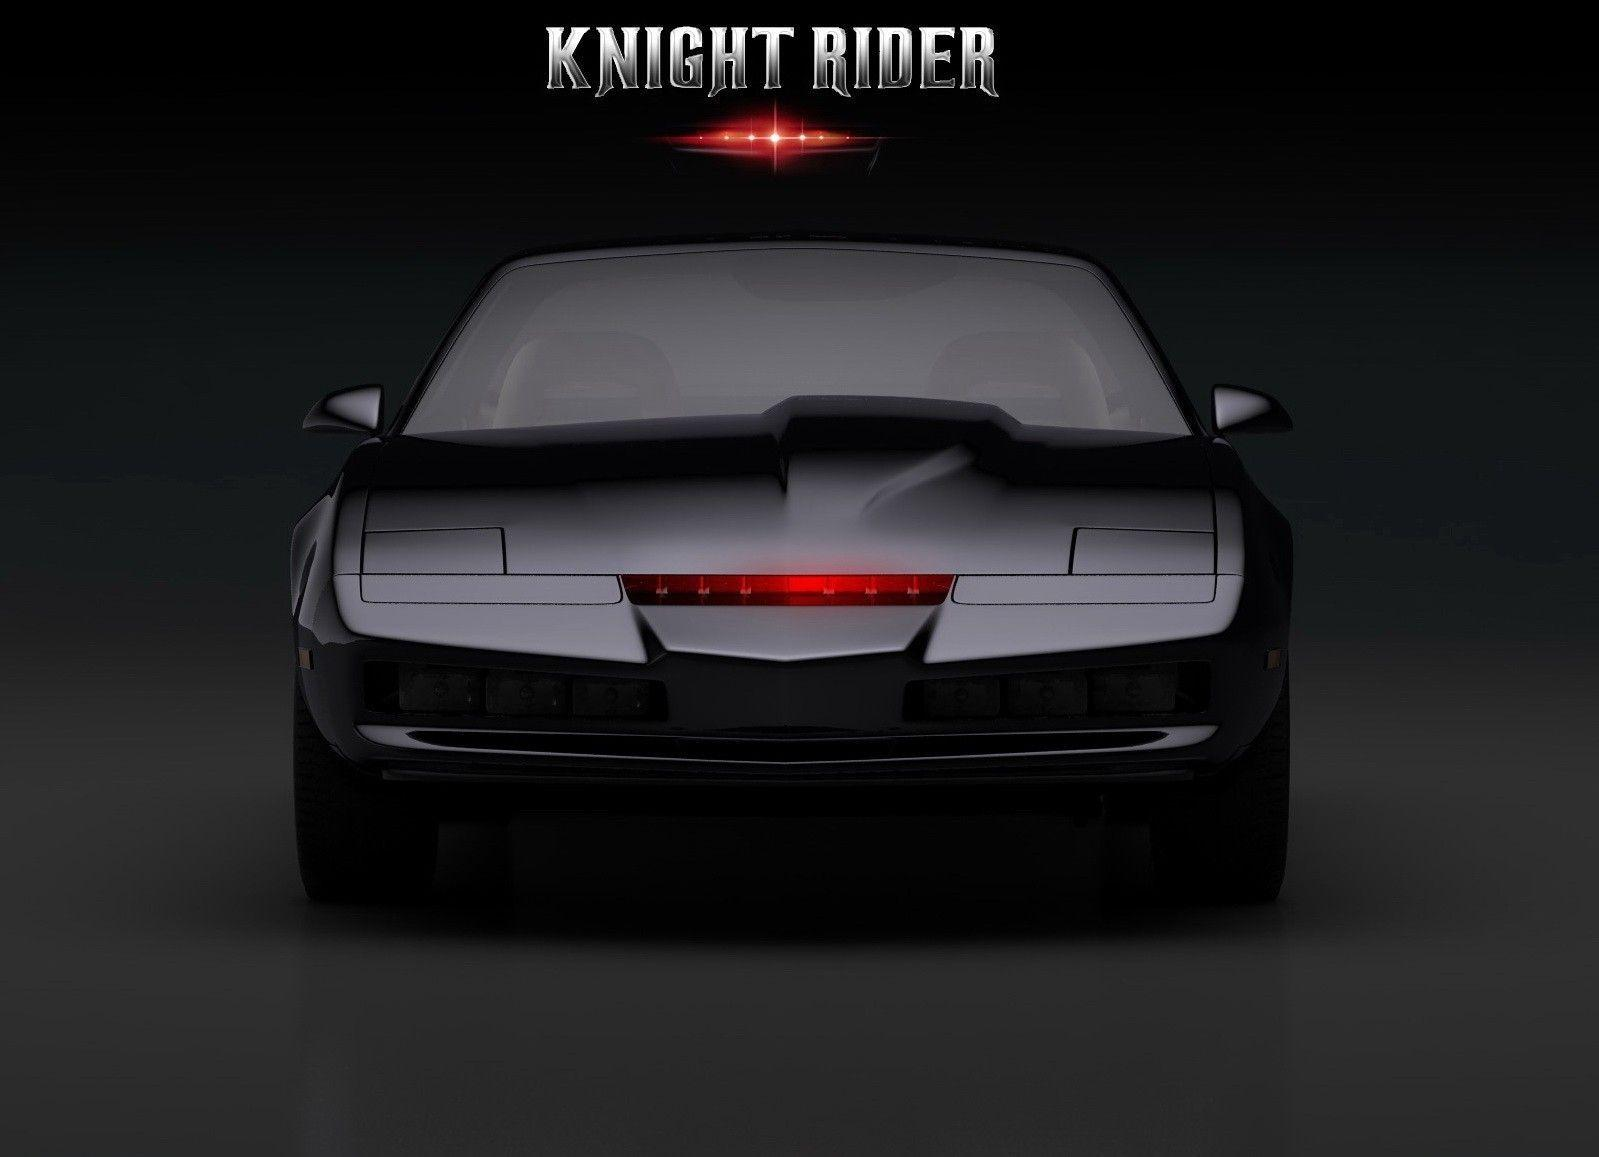 sport cars, #Pontiac, #simple background, #Knight Rider, #K.I.T.T.